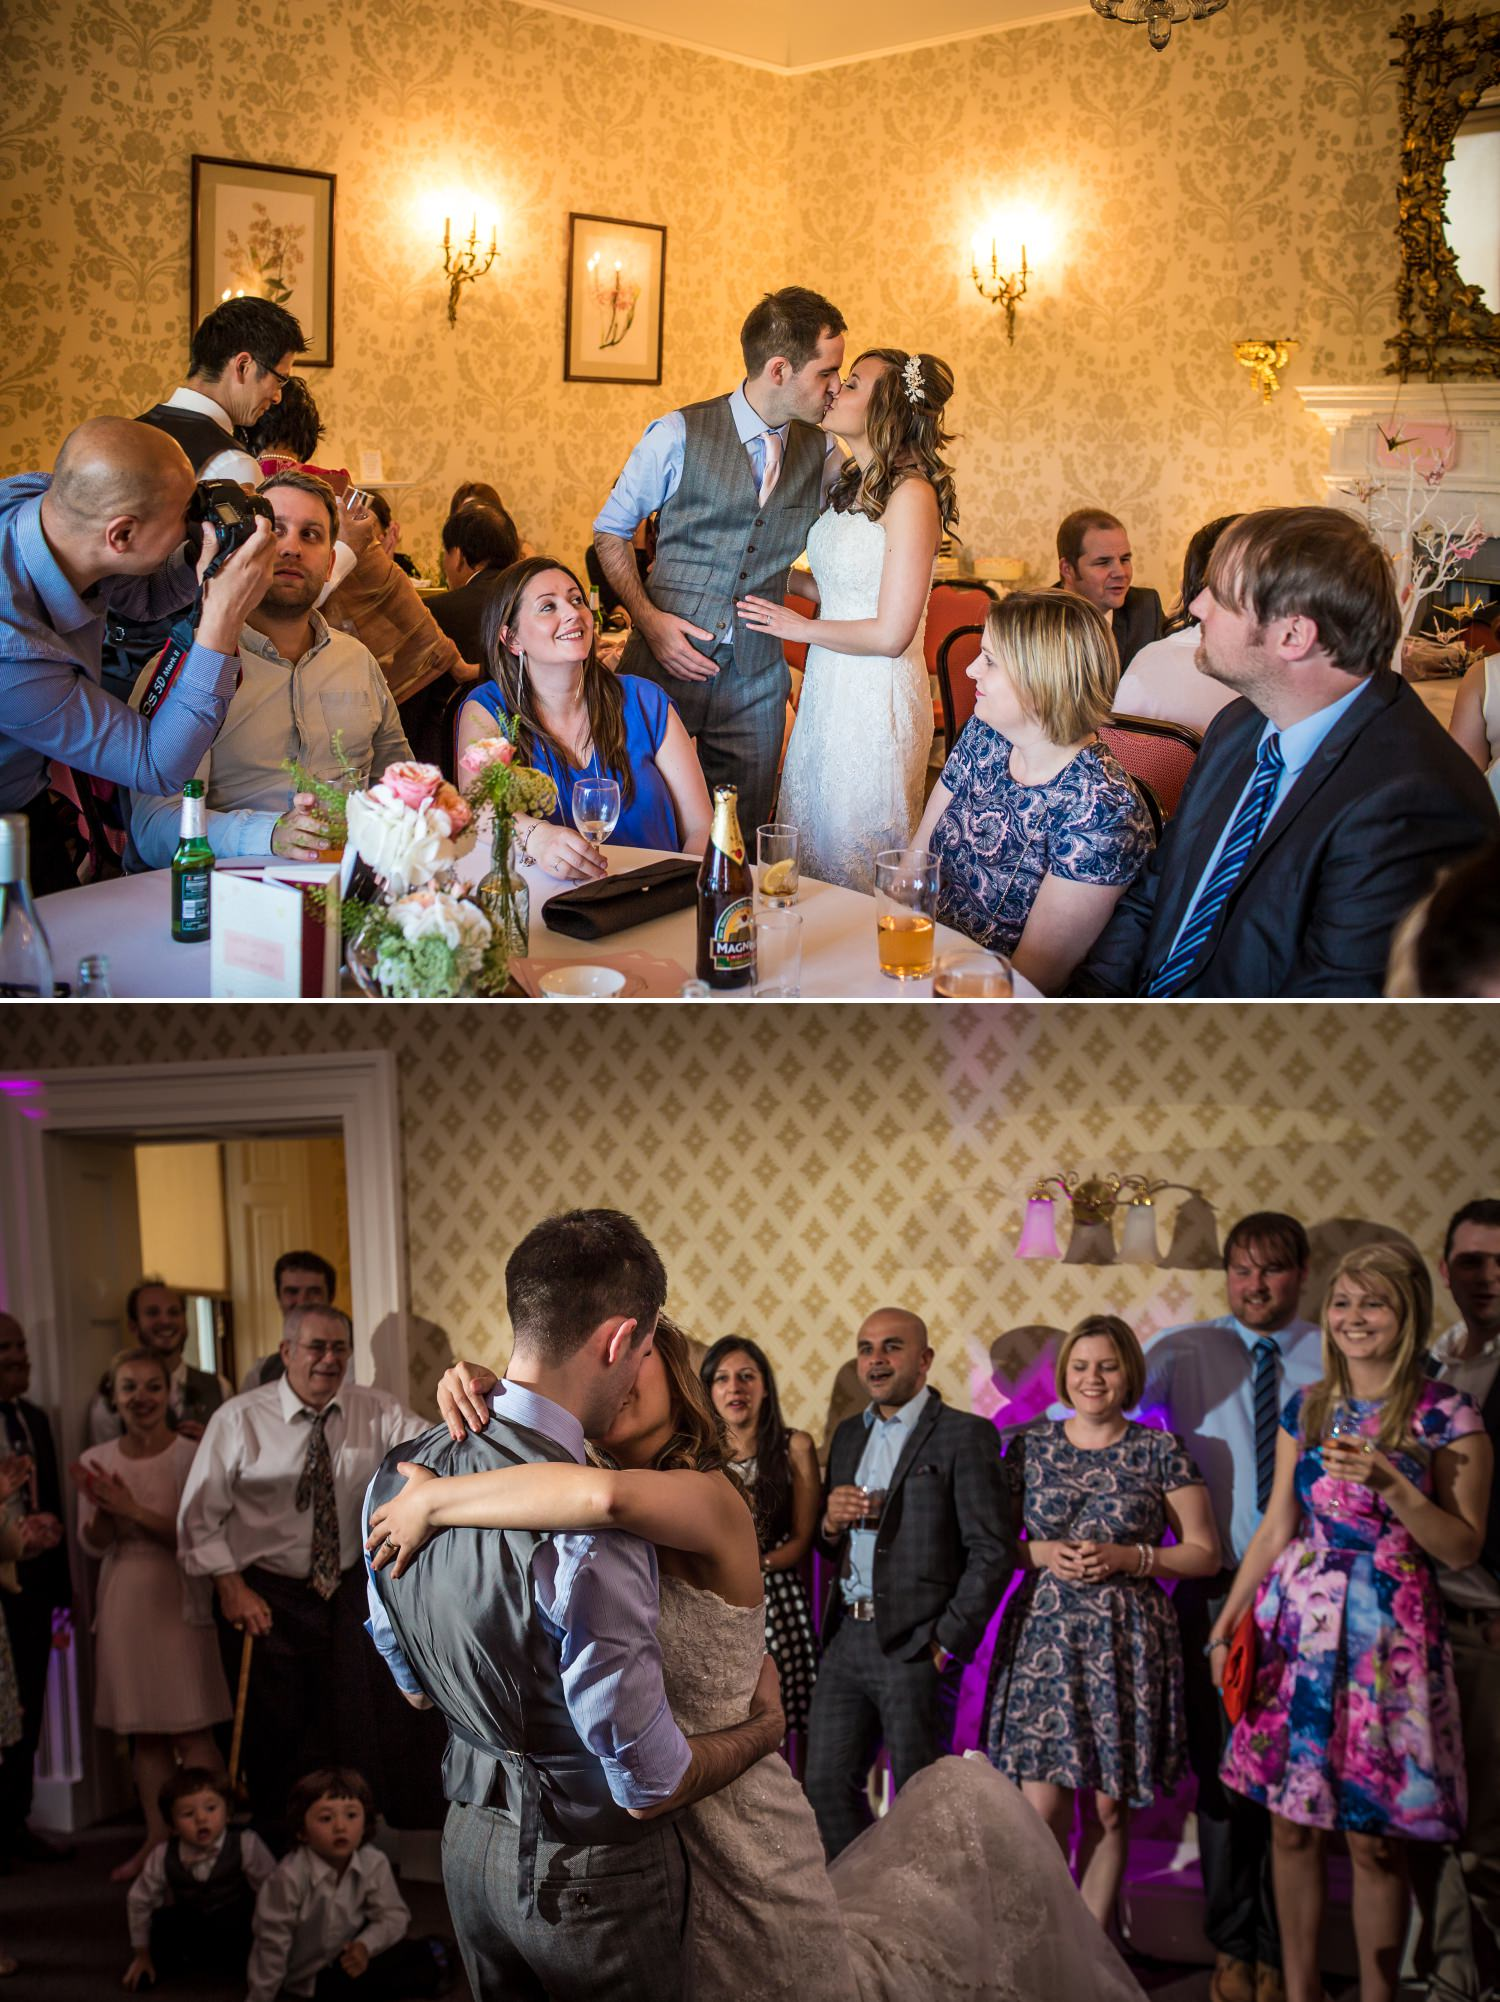 Wedding Photographer Tatton Park, Cheshire